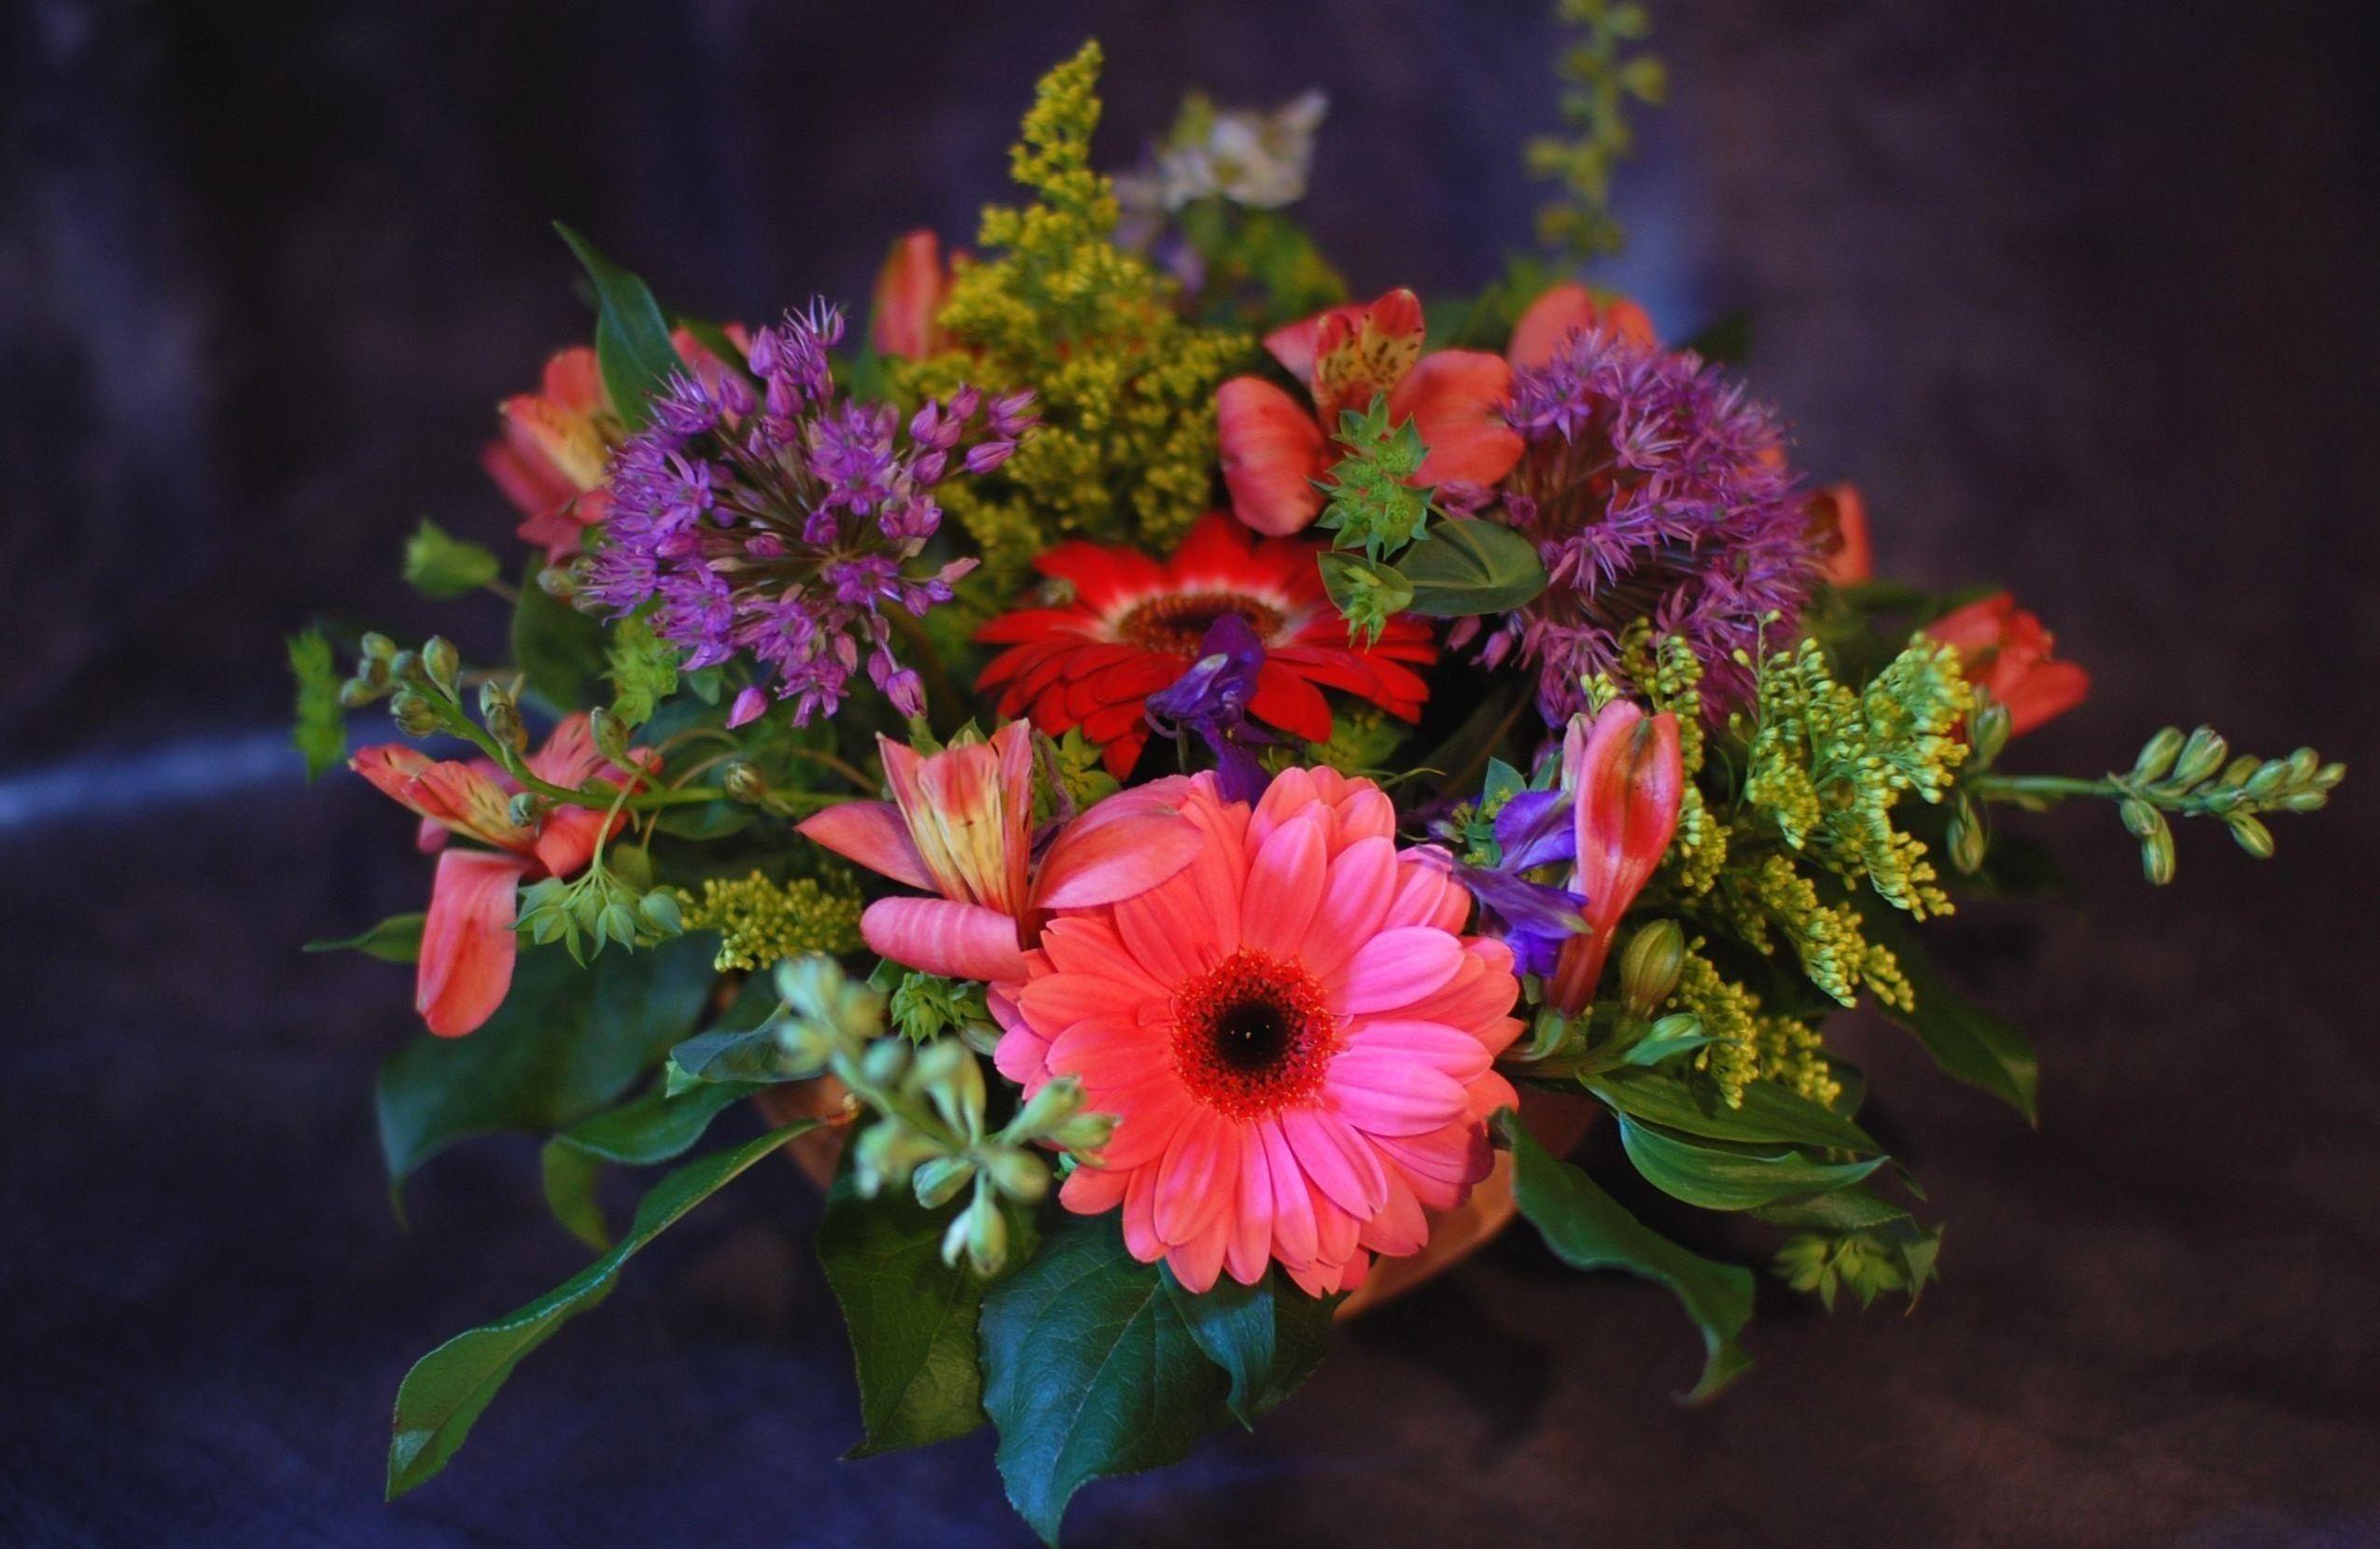 Сальвия рио фото цветов